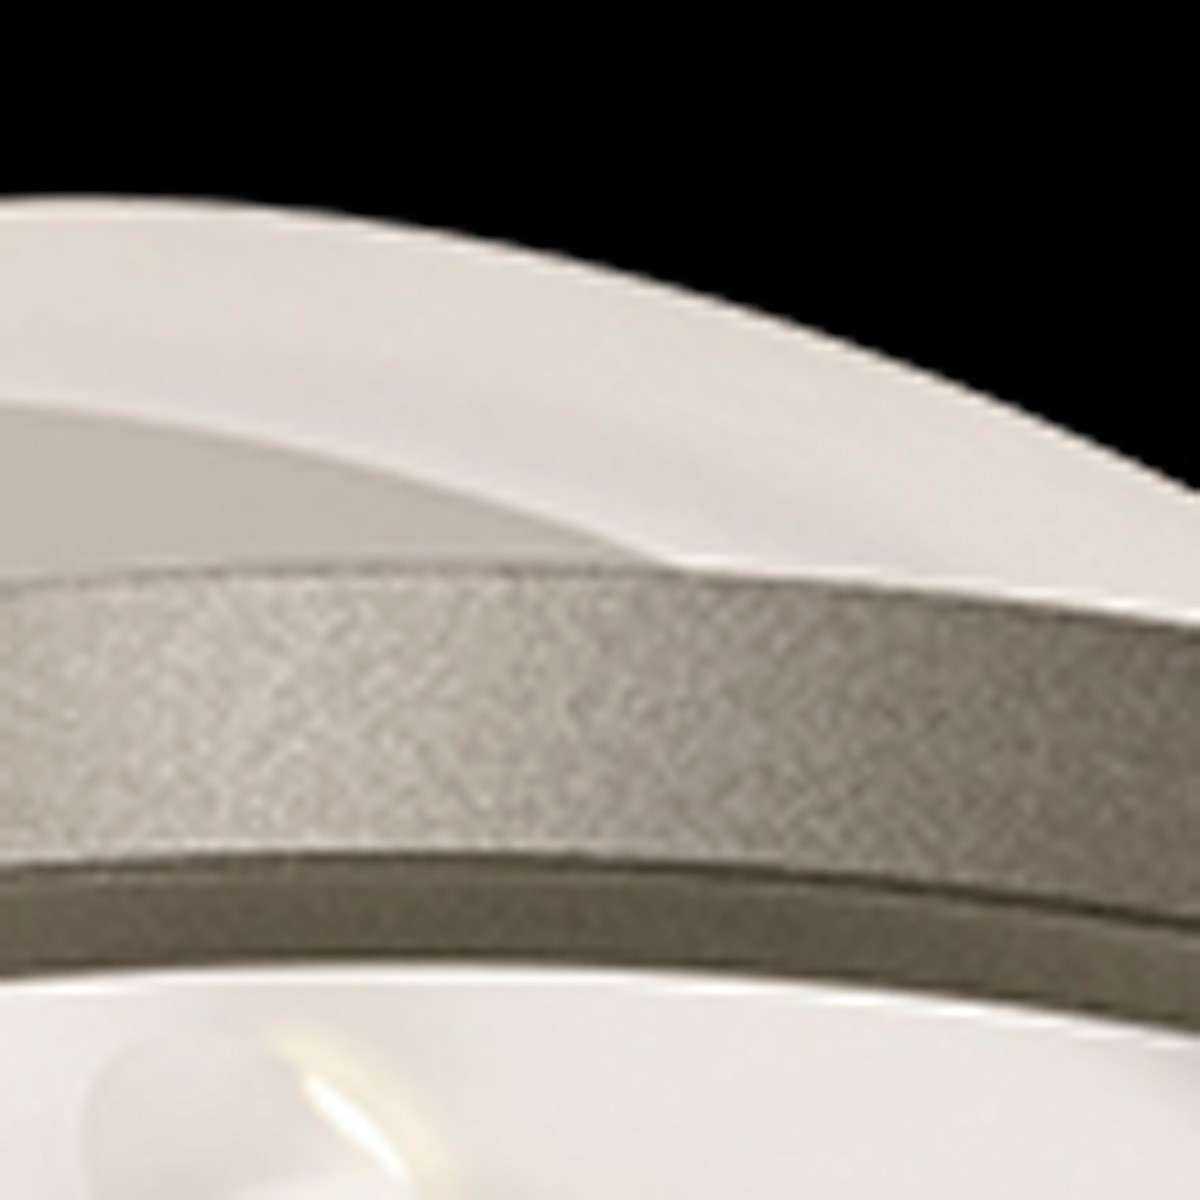 Nimbus Rim R 9 Deckenleuchte, 2700 K, titangrau matt eloxiert